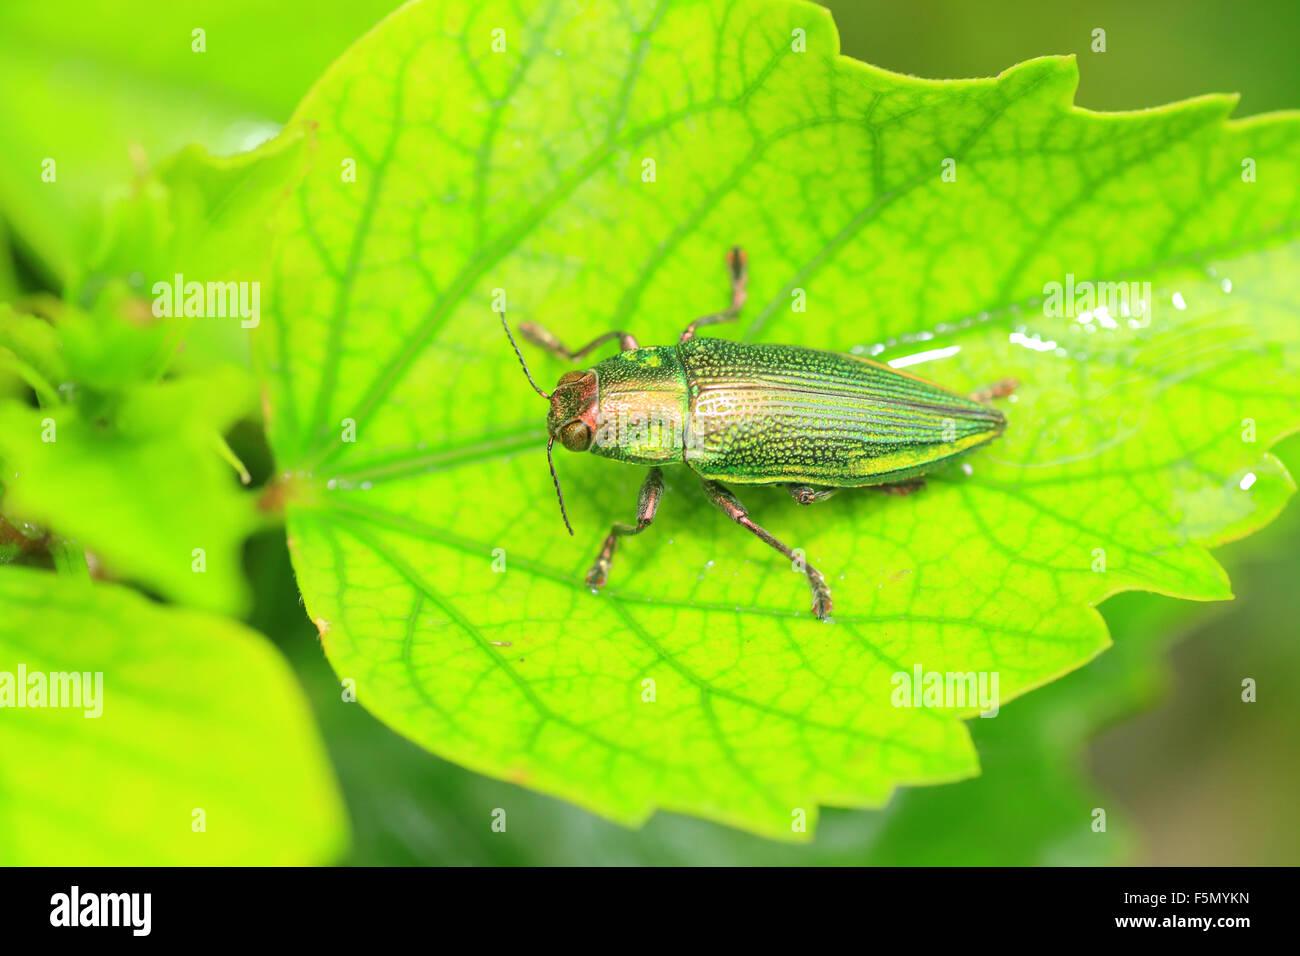 Ryukyu Jewel beetle (Chrysodema dalmanni) in Japan - Stock Image